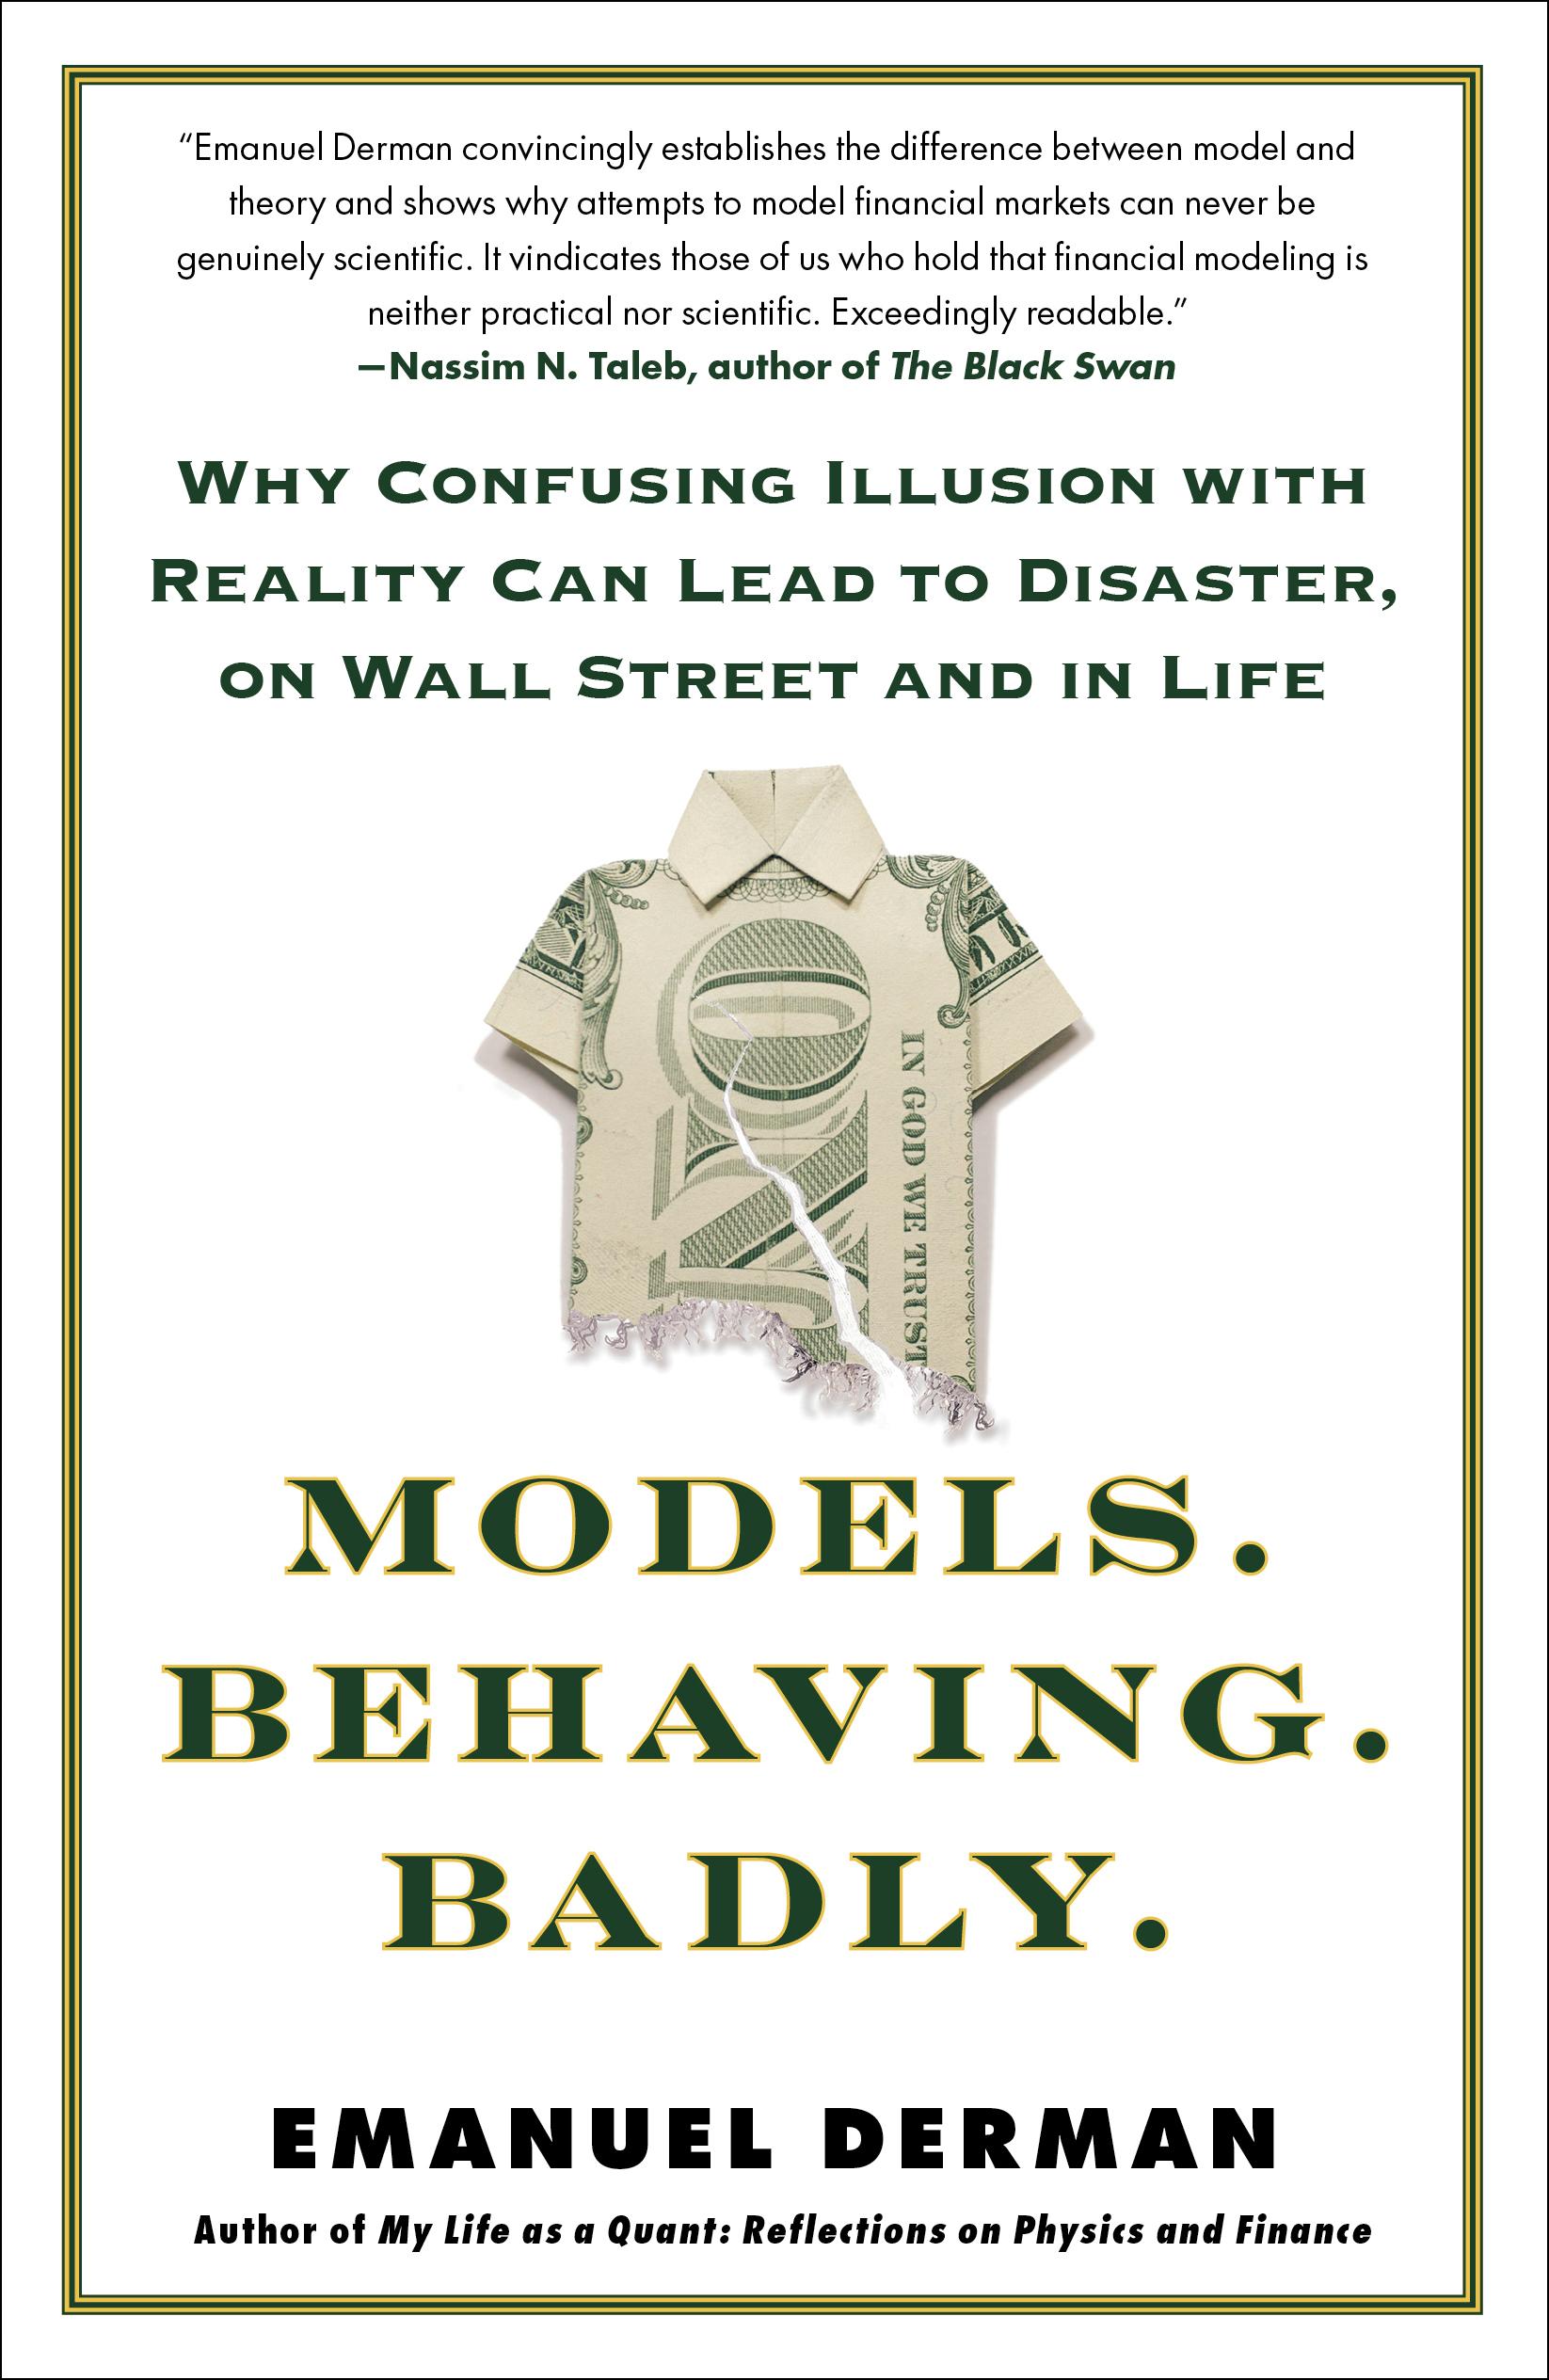 Models.Behaving.Badly-bookcover.jpg